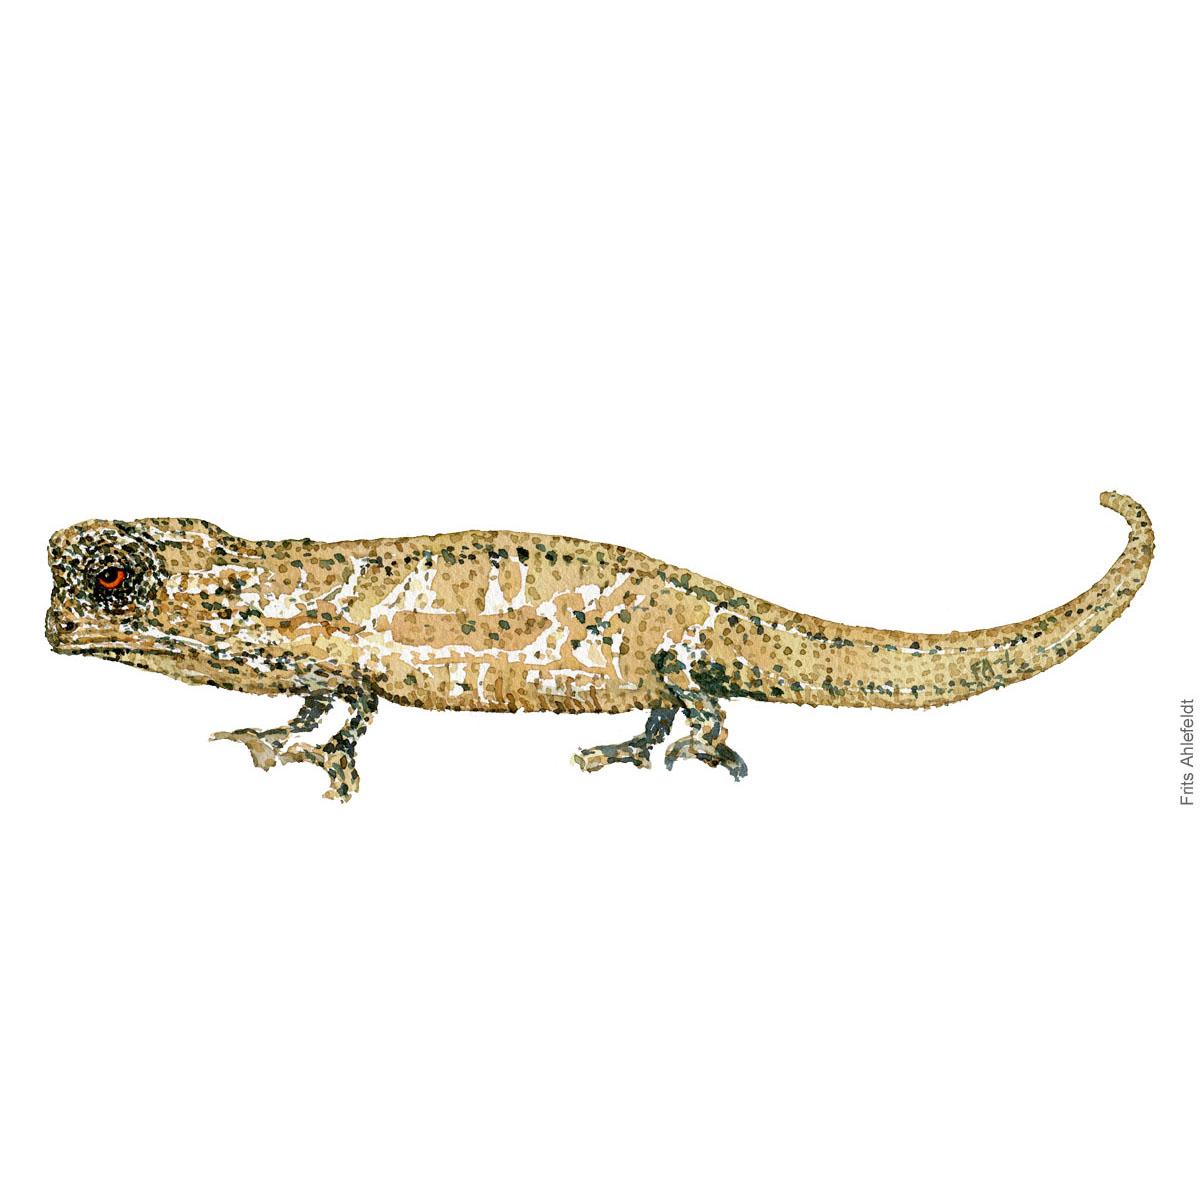 Dwarf chameleon - Watercolor by Frits Ahlefeldt